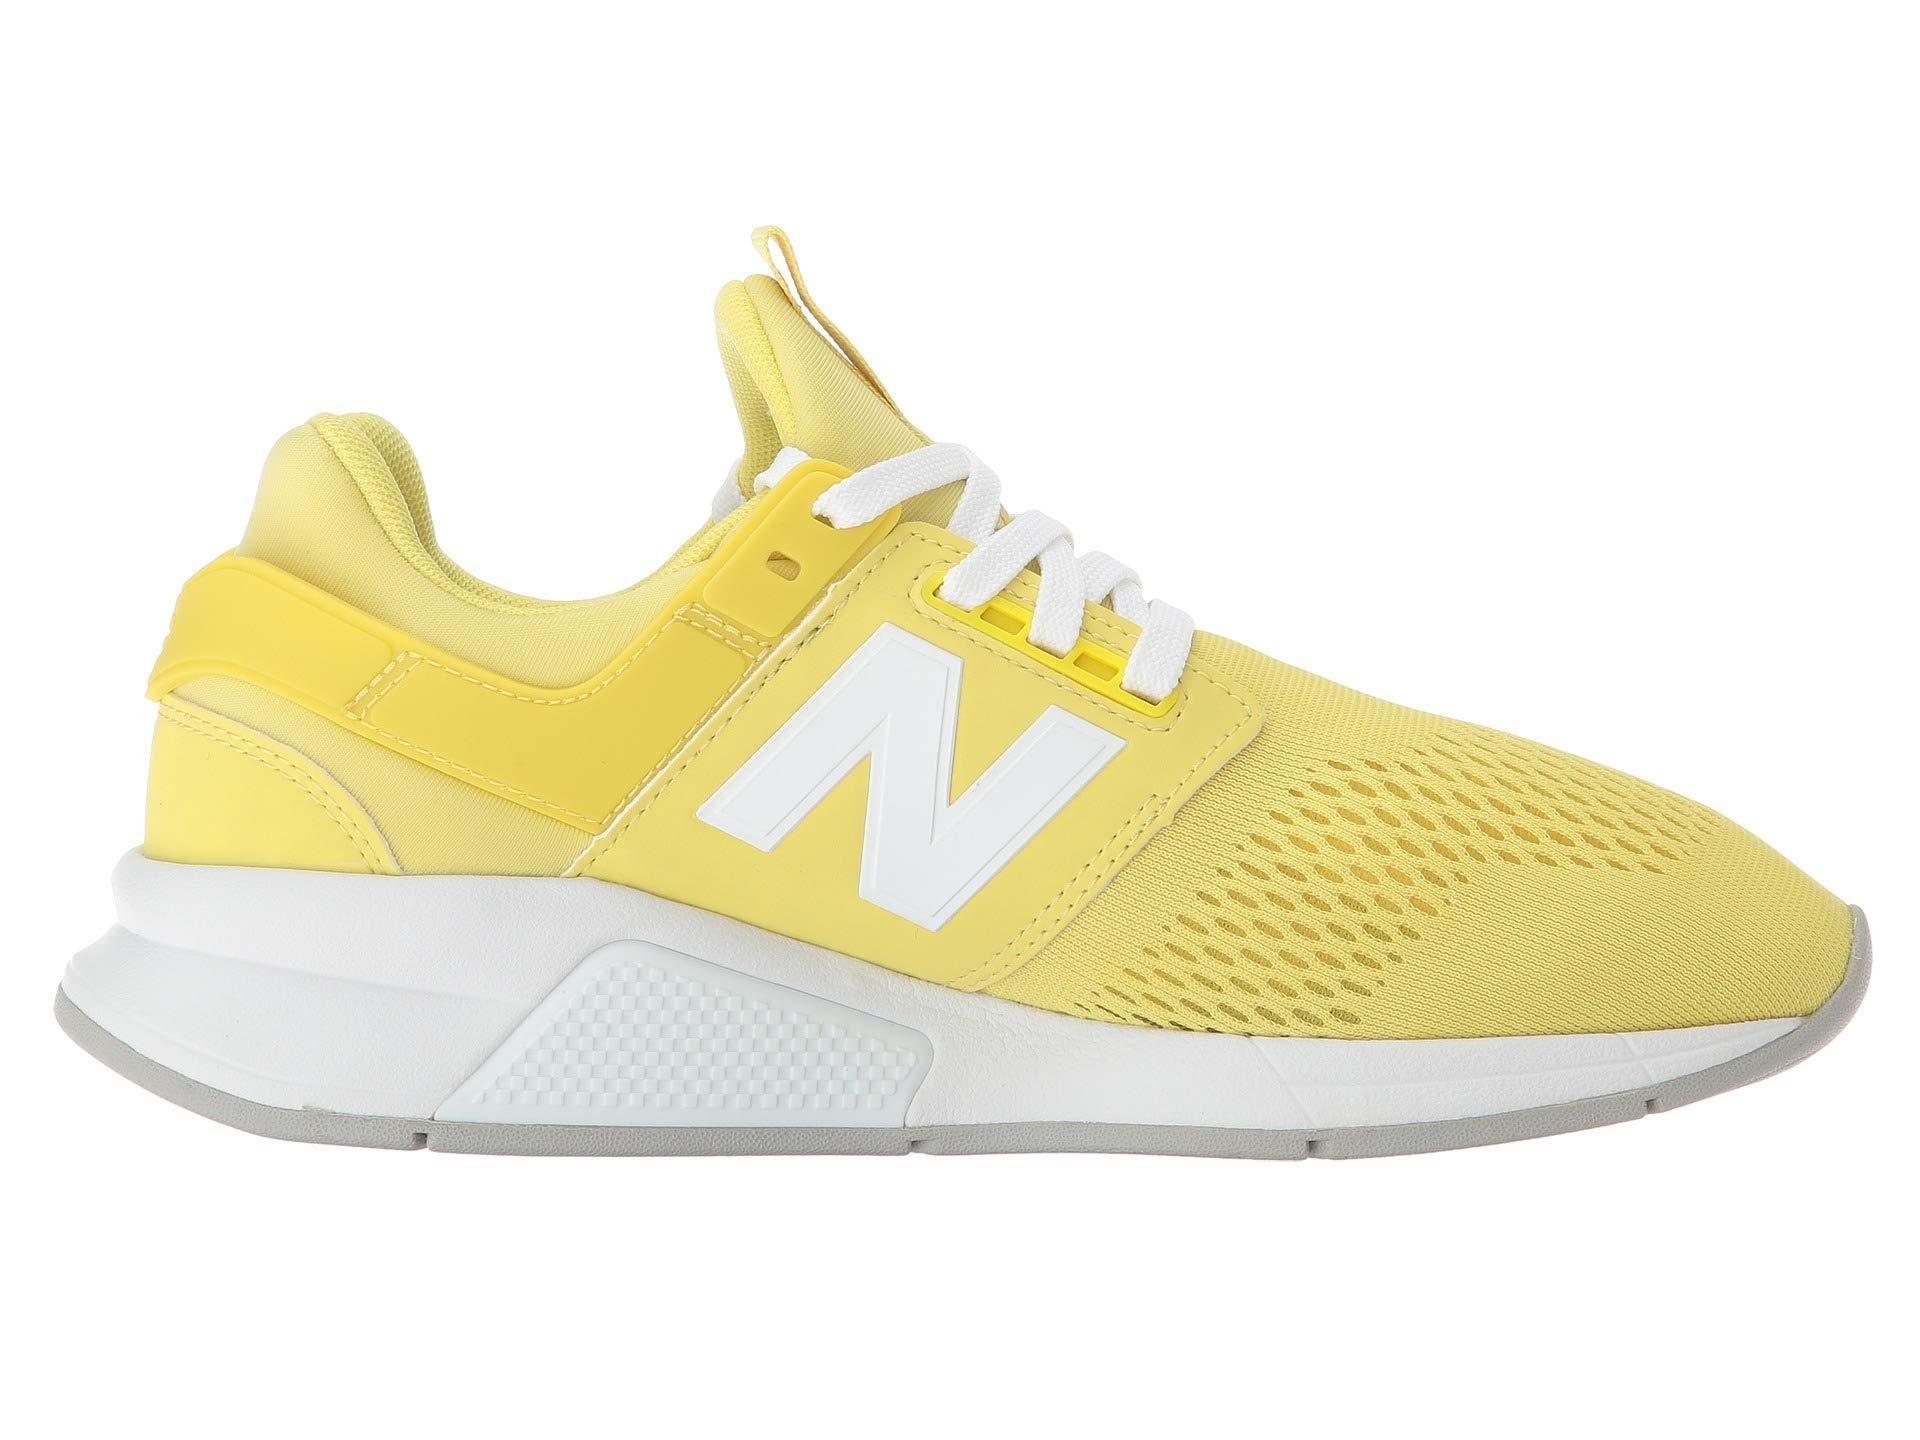 159971d6b663b New Balance Women 247 Tritium WS247UG, Lemonade with White   Shoes ...